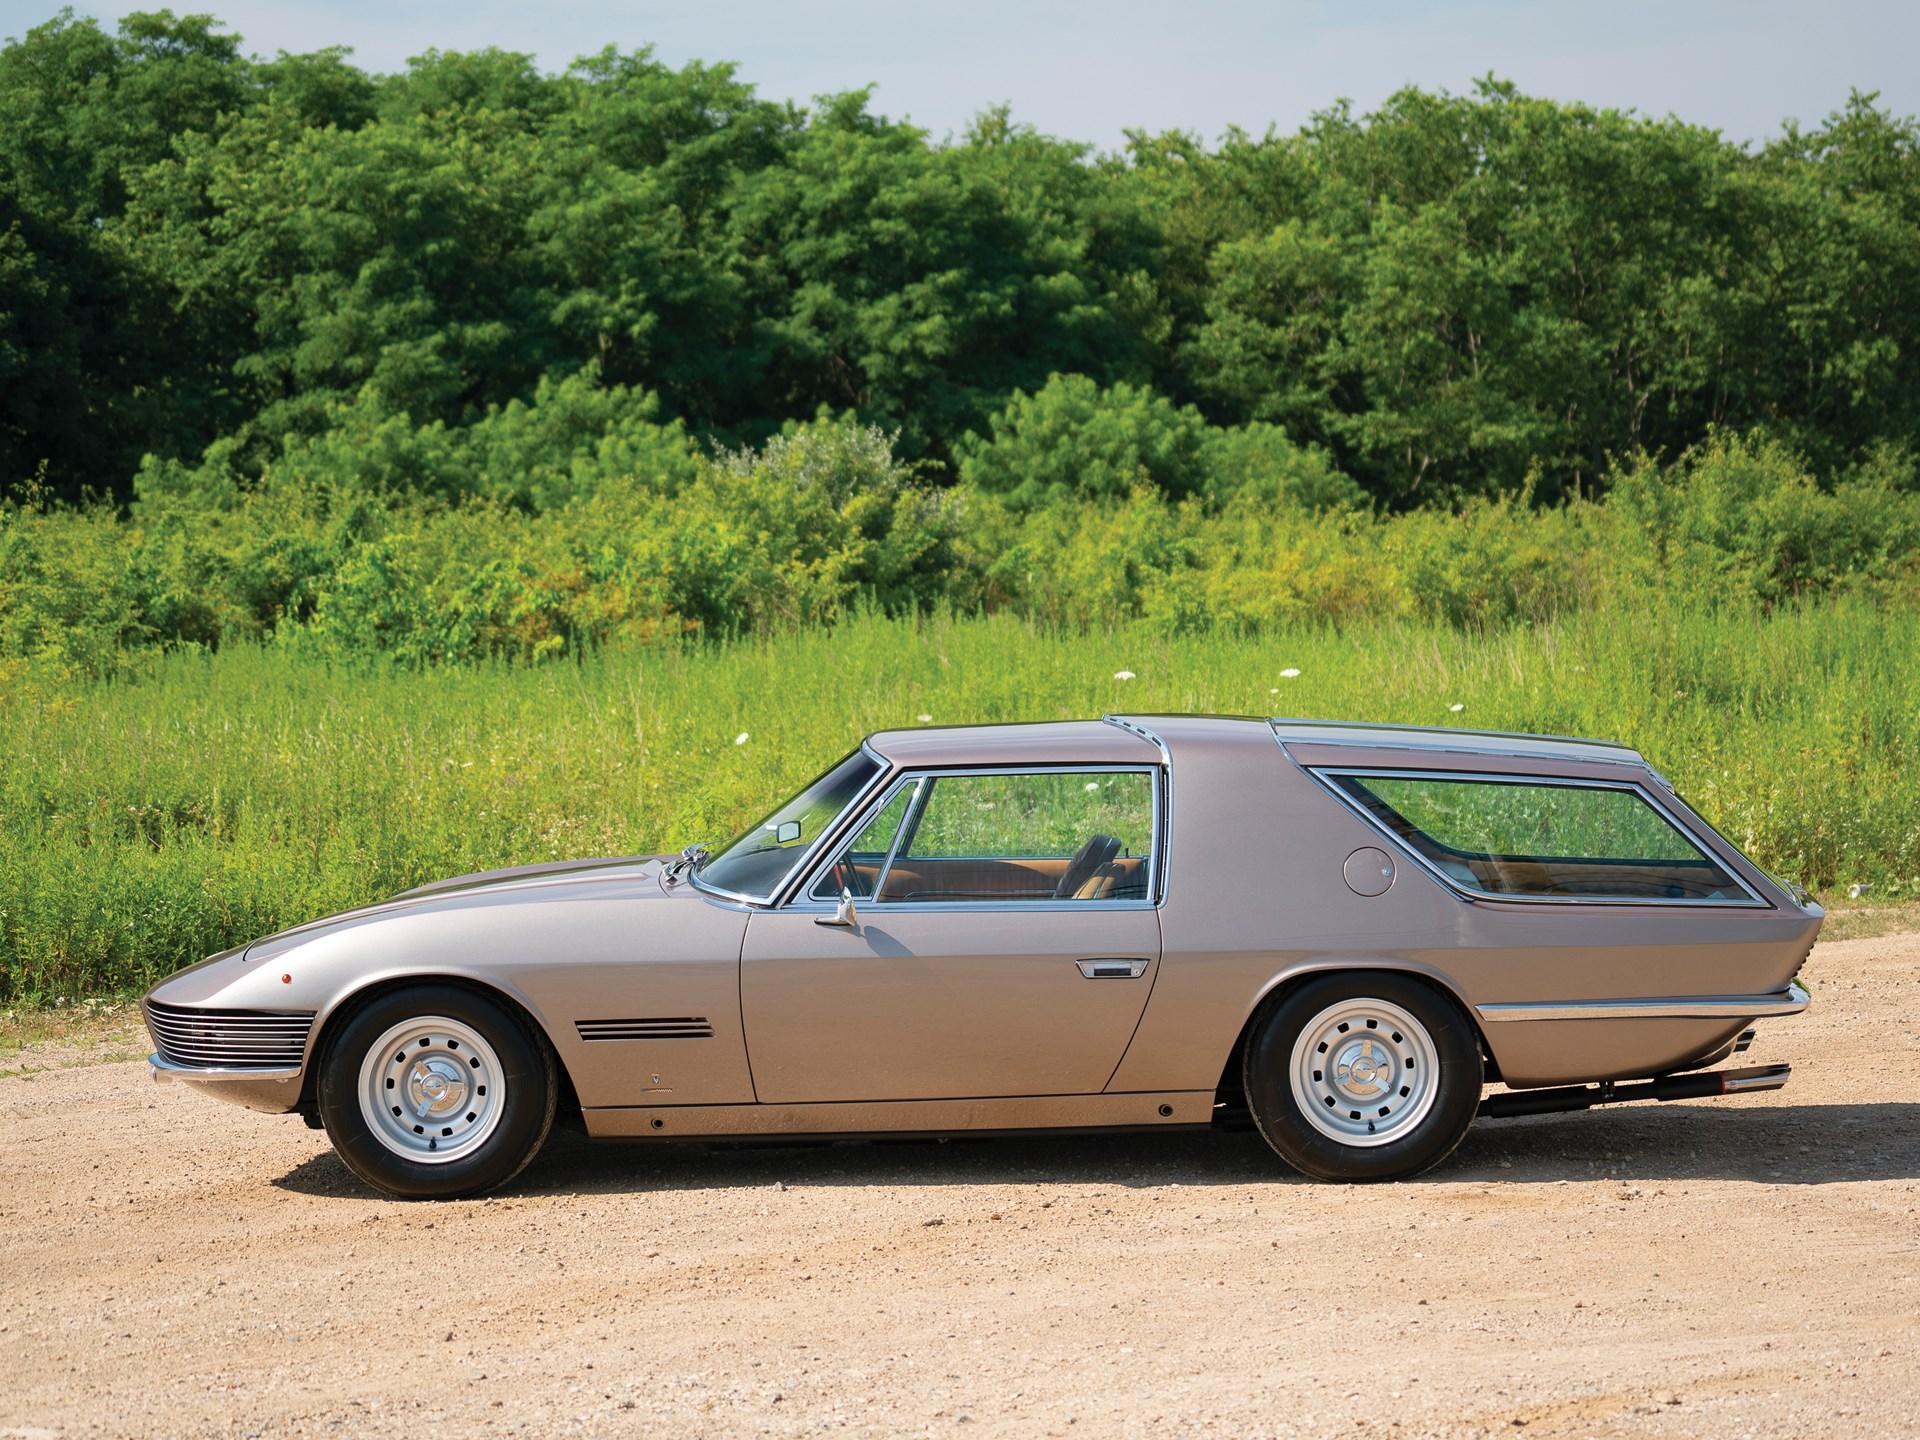 1965 Ferrari 330 GT 2+2 Shooting Brake side profile